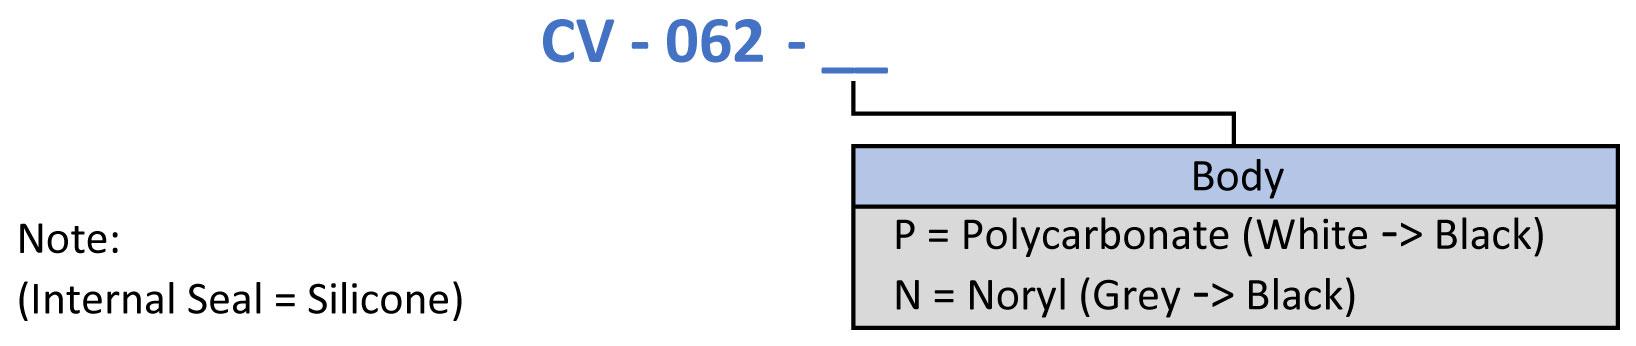 CV-062